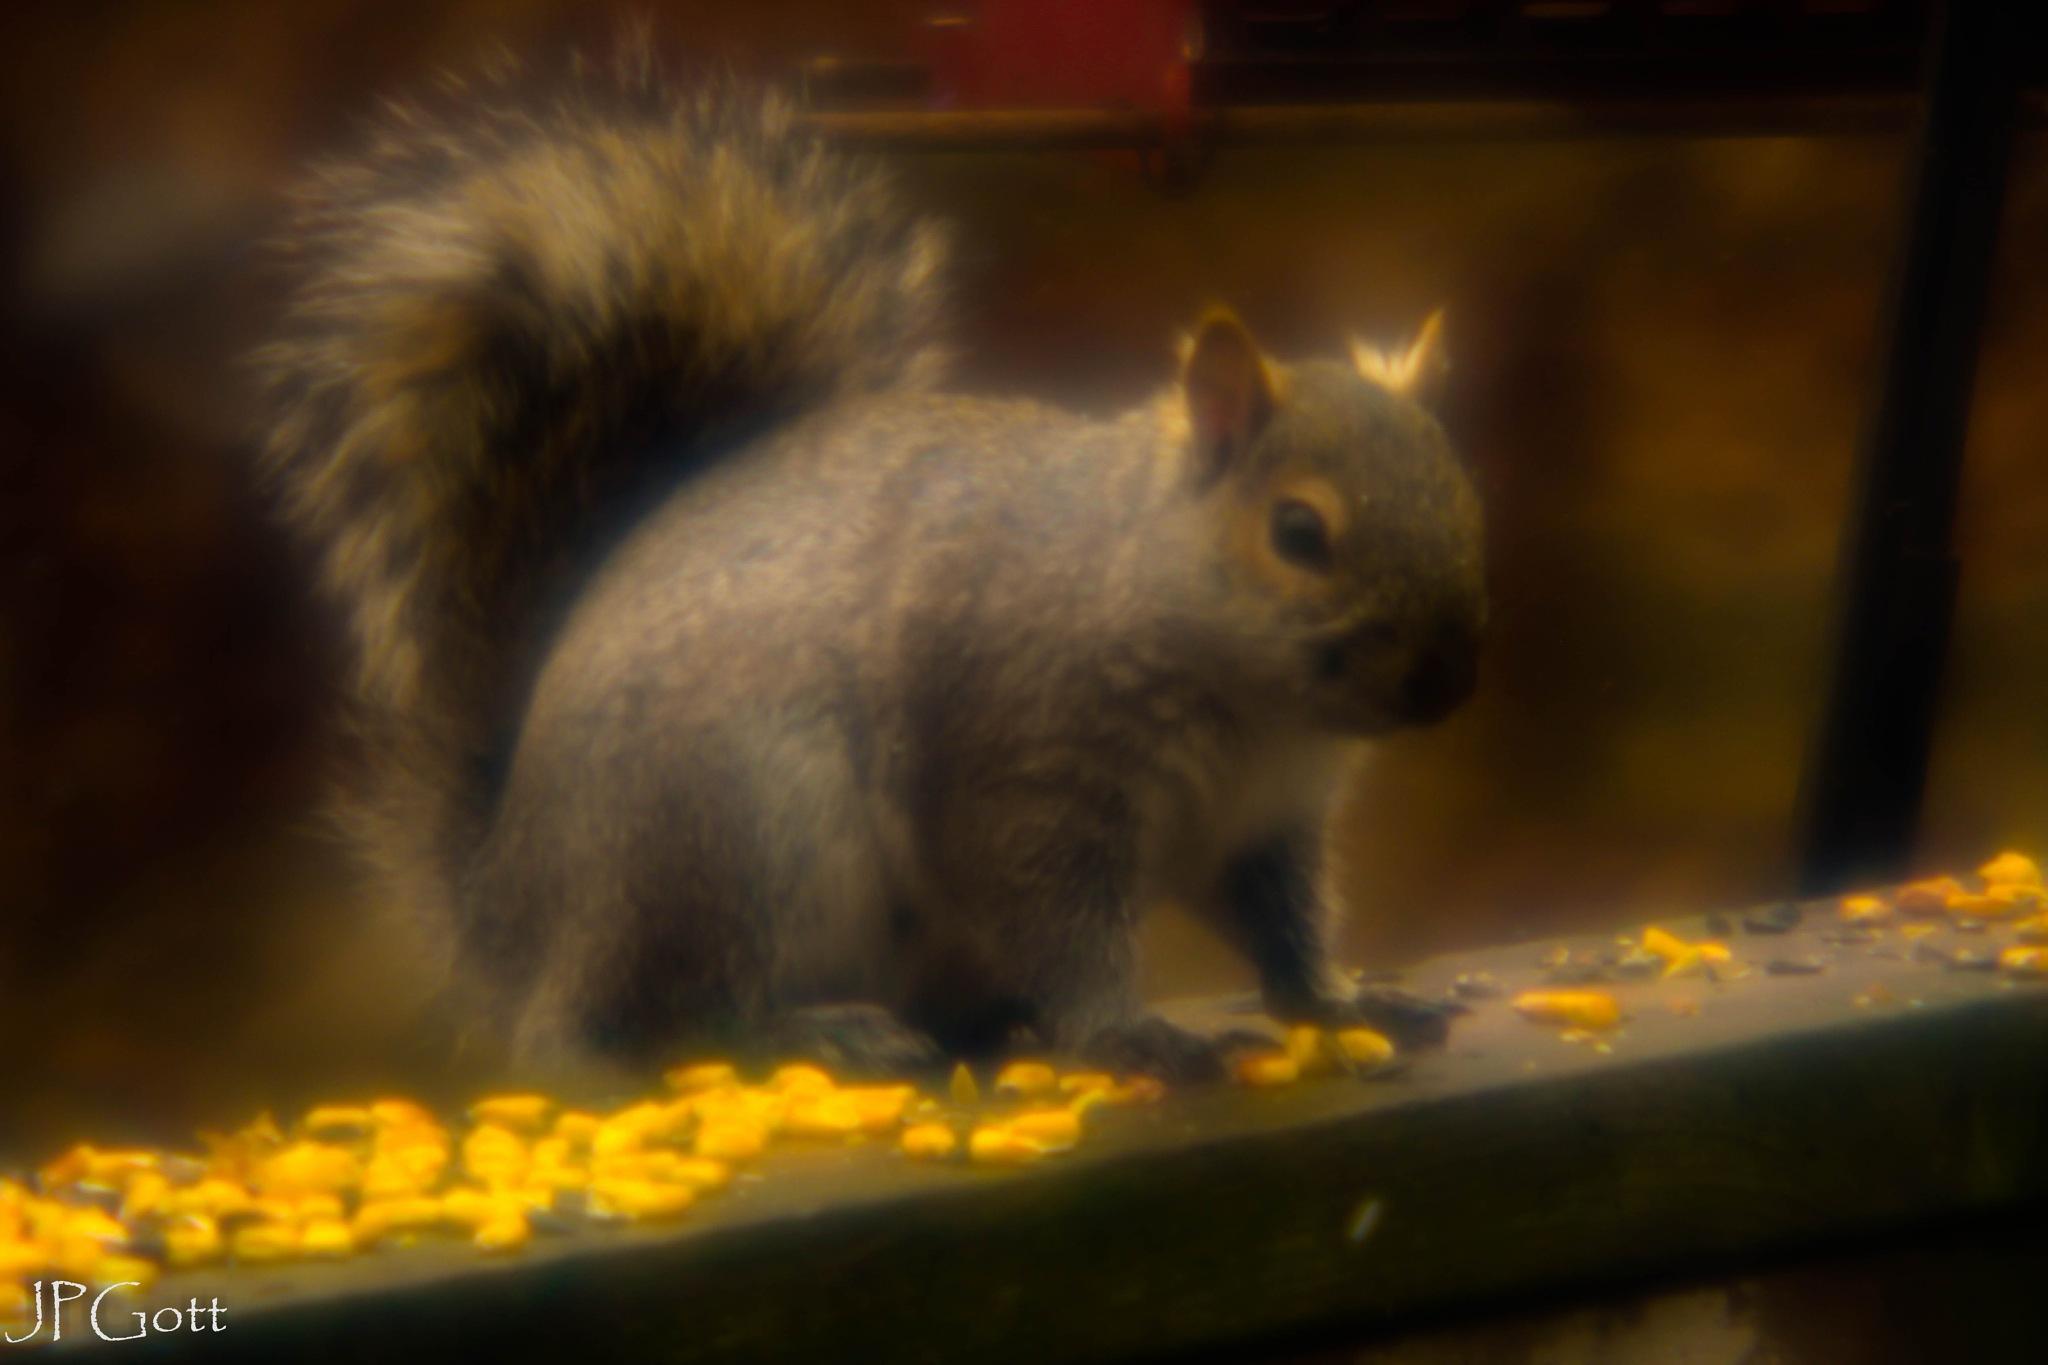 Corn eating Squirrel by JP Gott